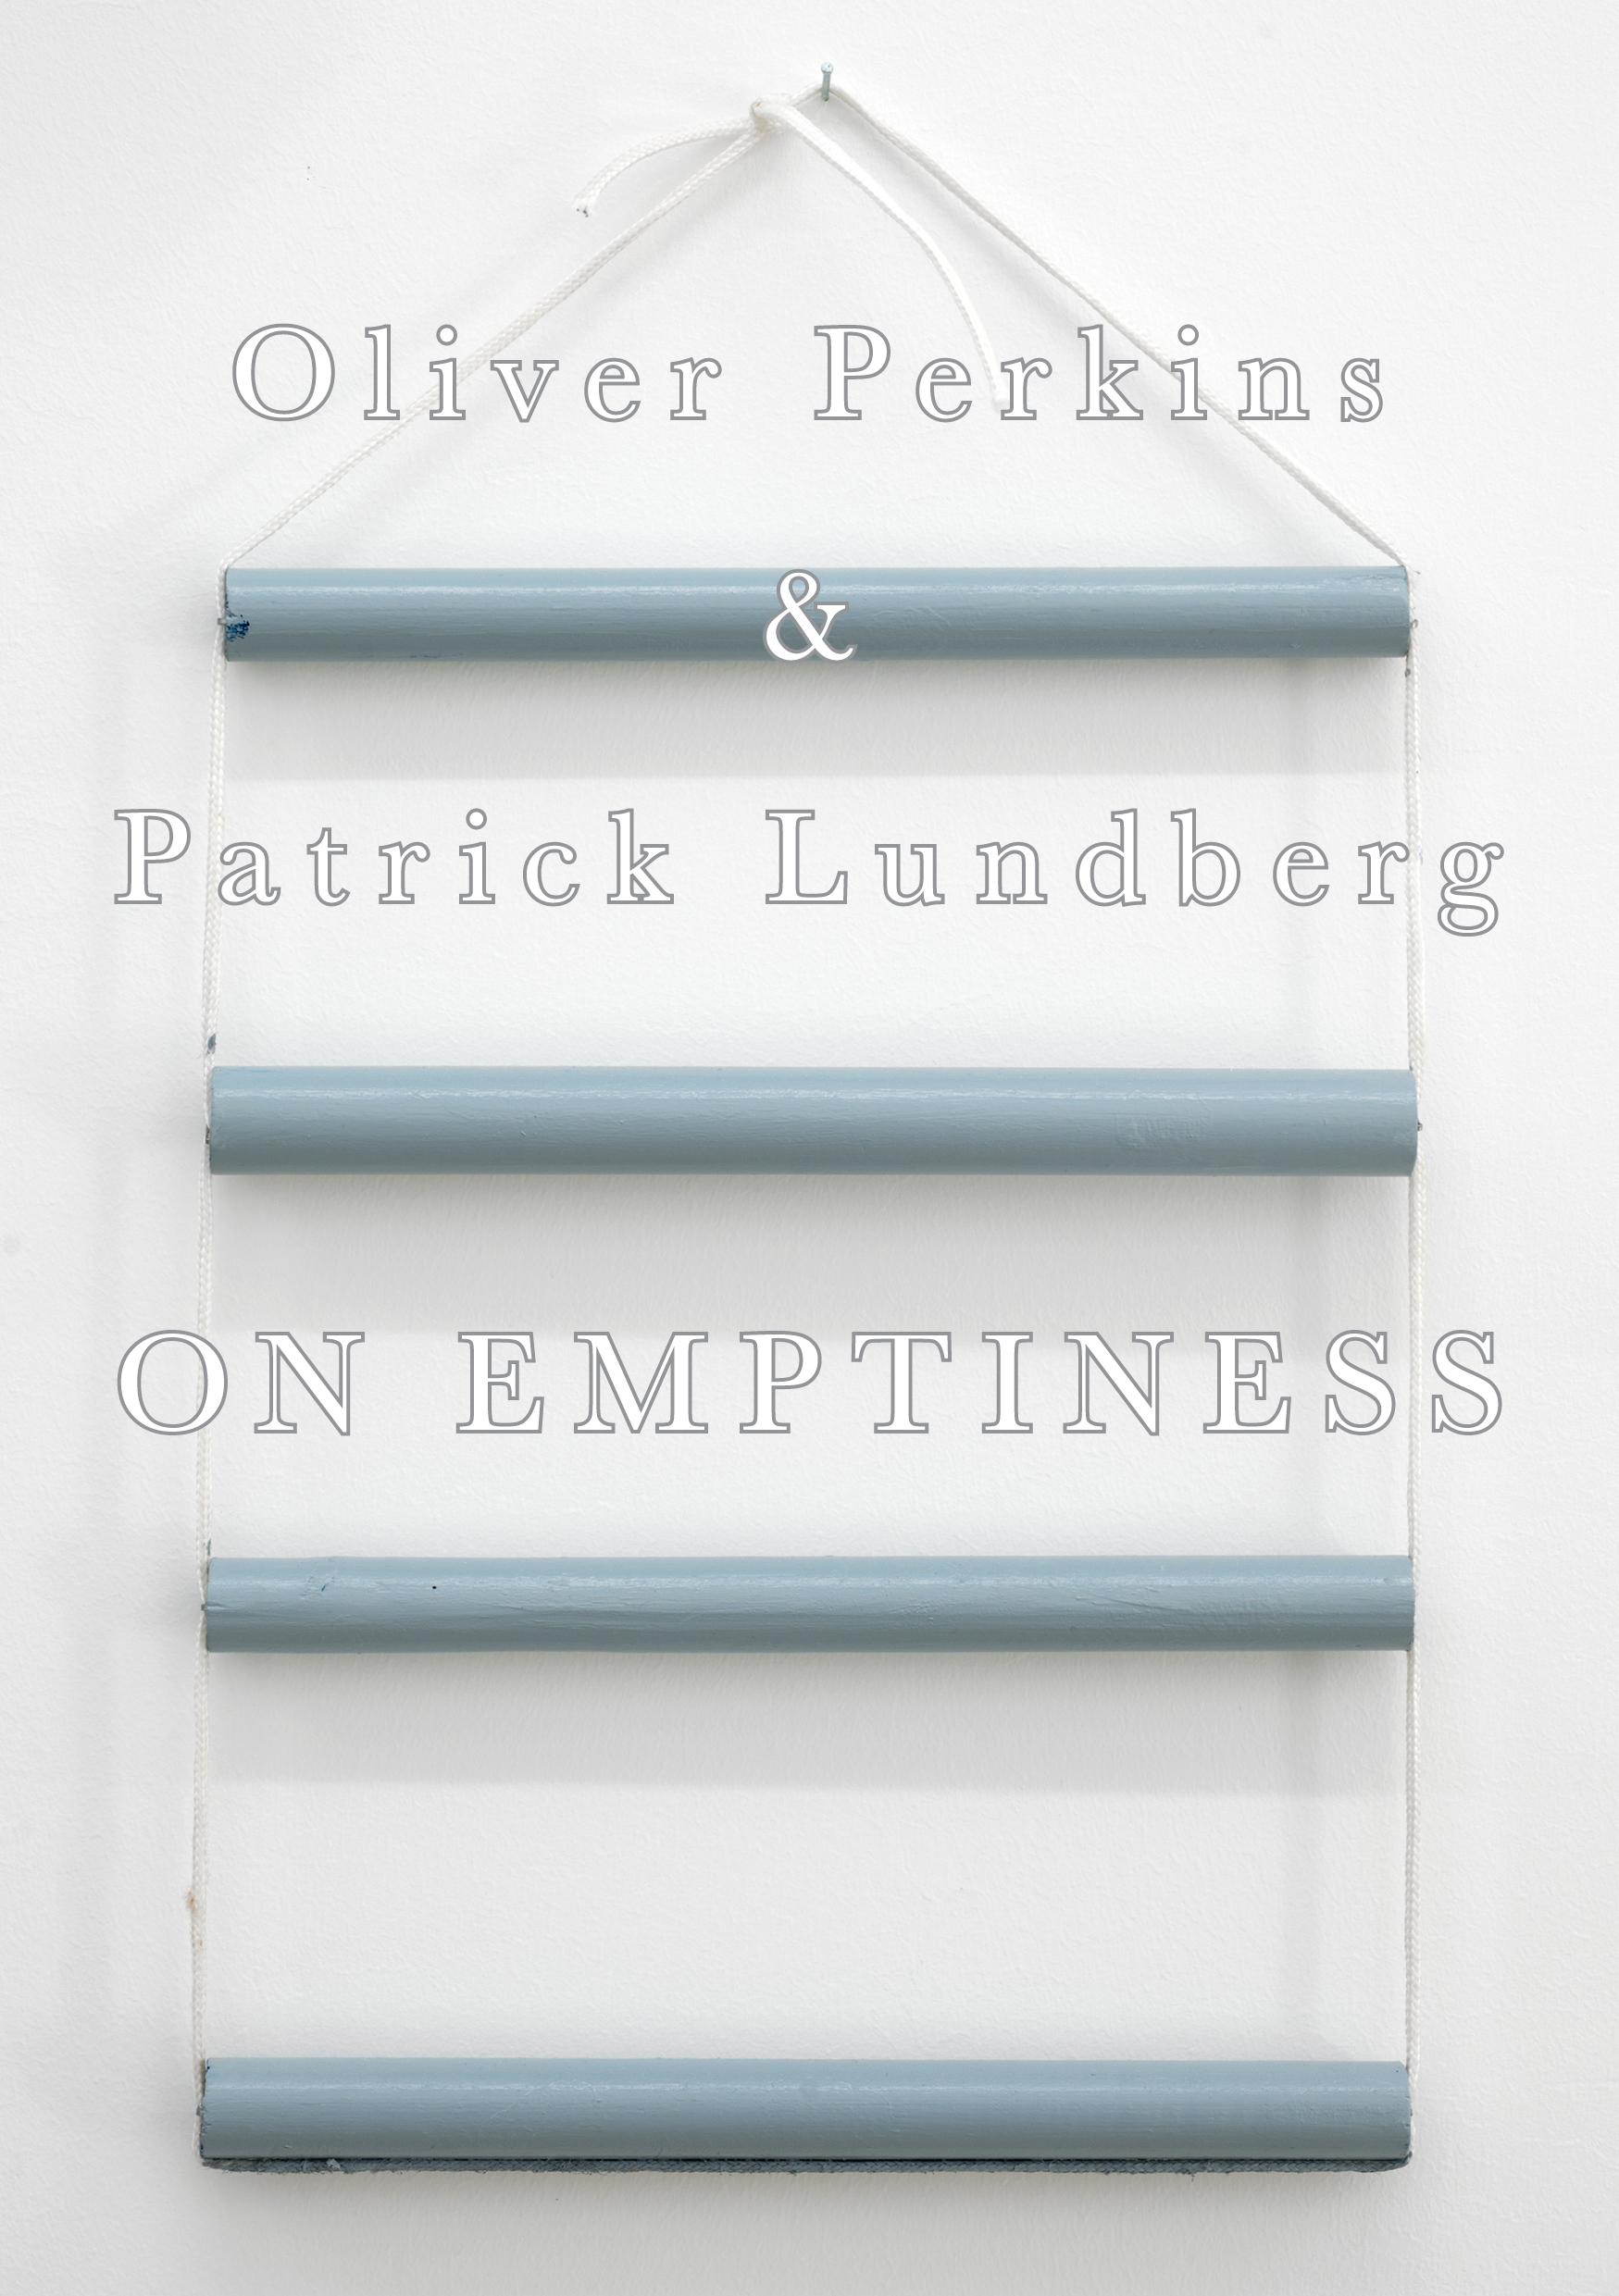 On Emptiness